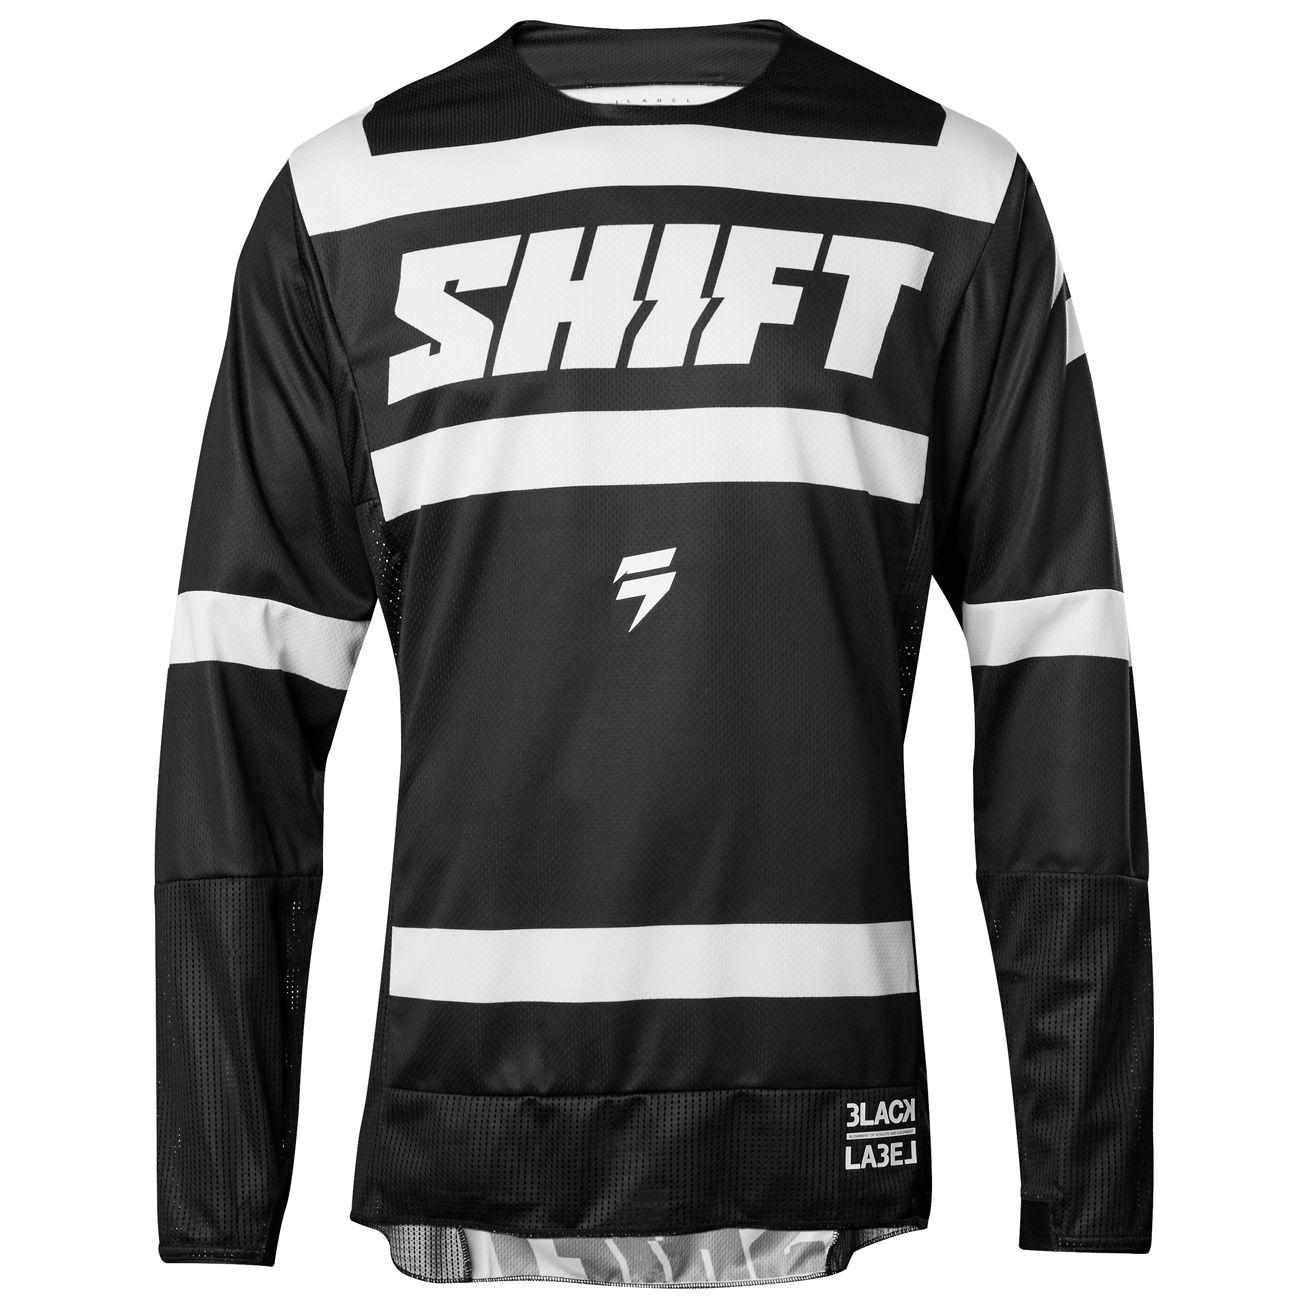 maillot cross shift black strike noir blanc 2018 tenue cross. Black Bedroom Furniture Sets. Home Design Ideas